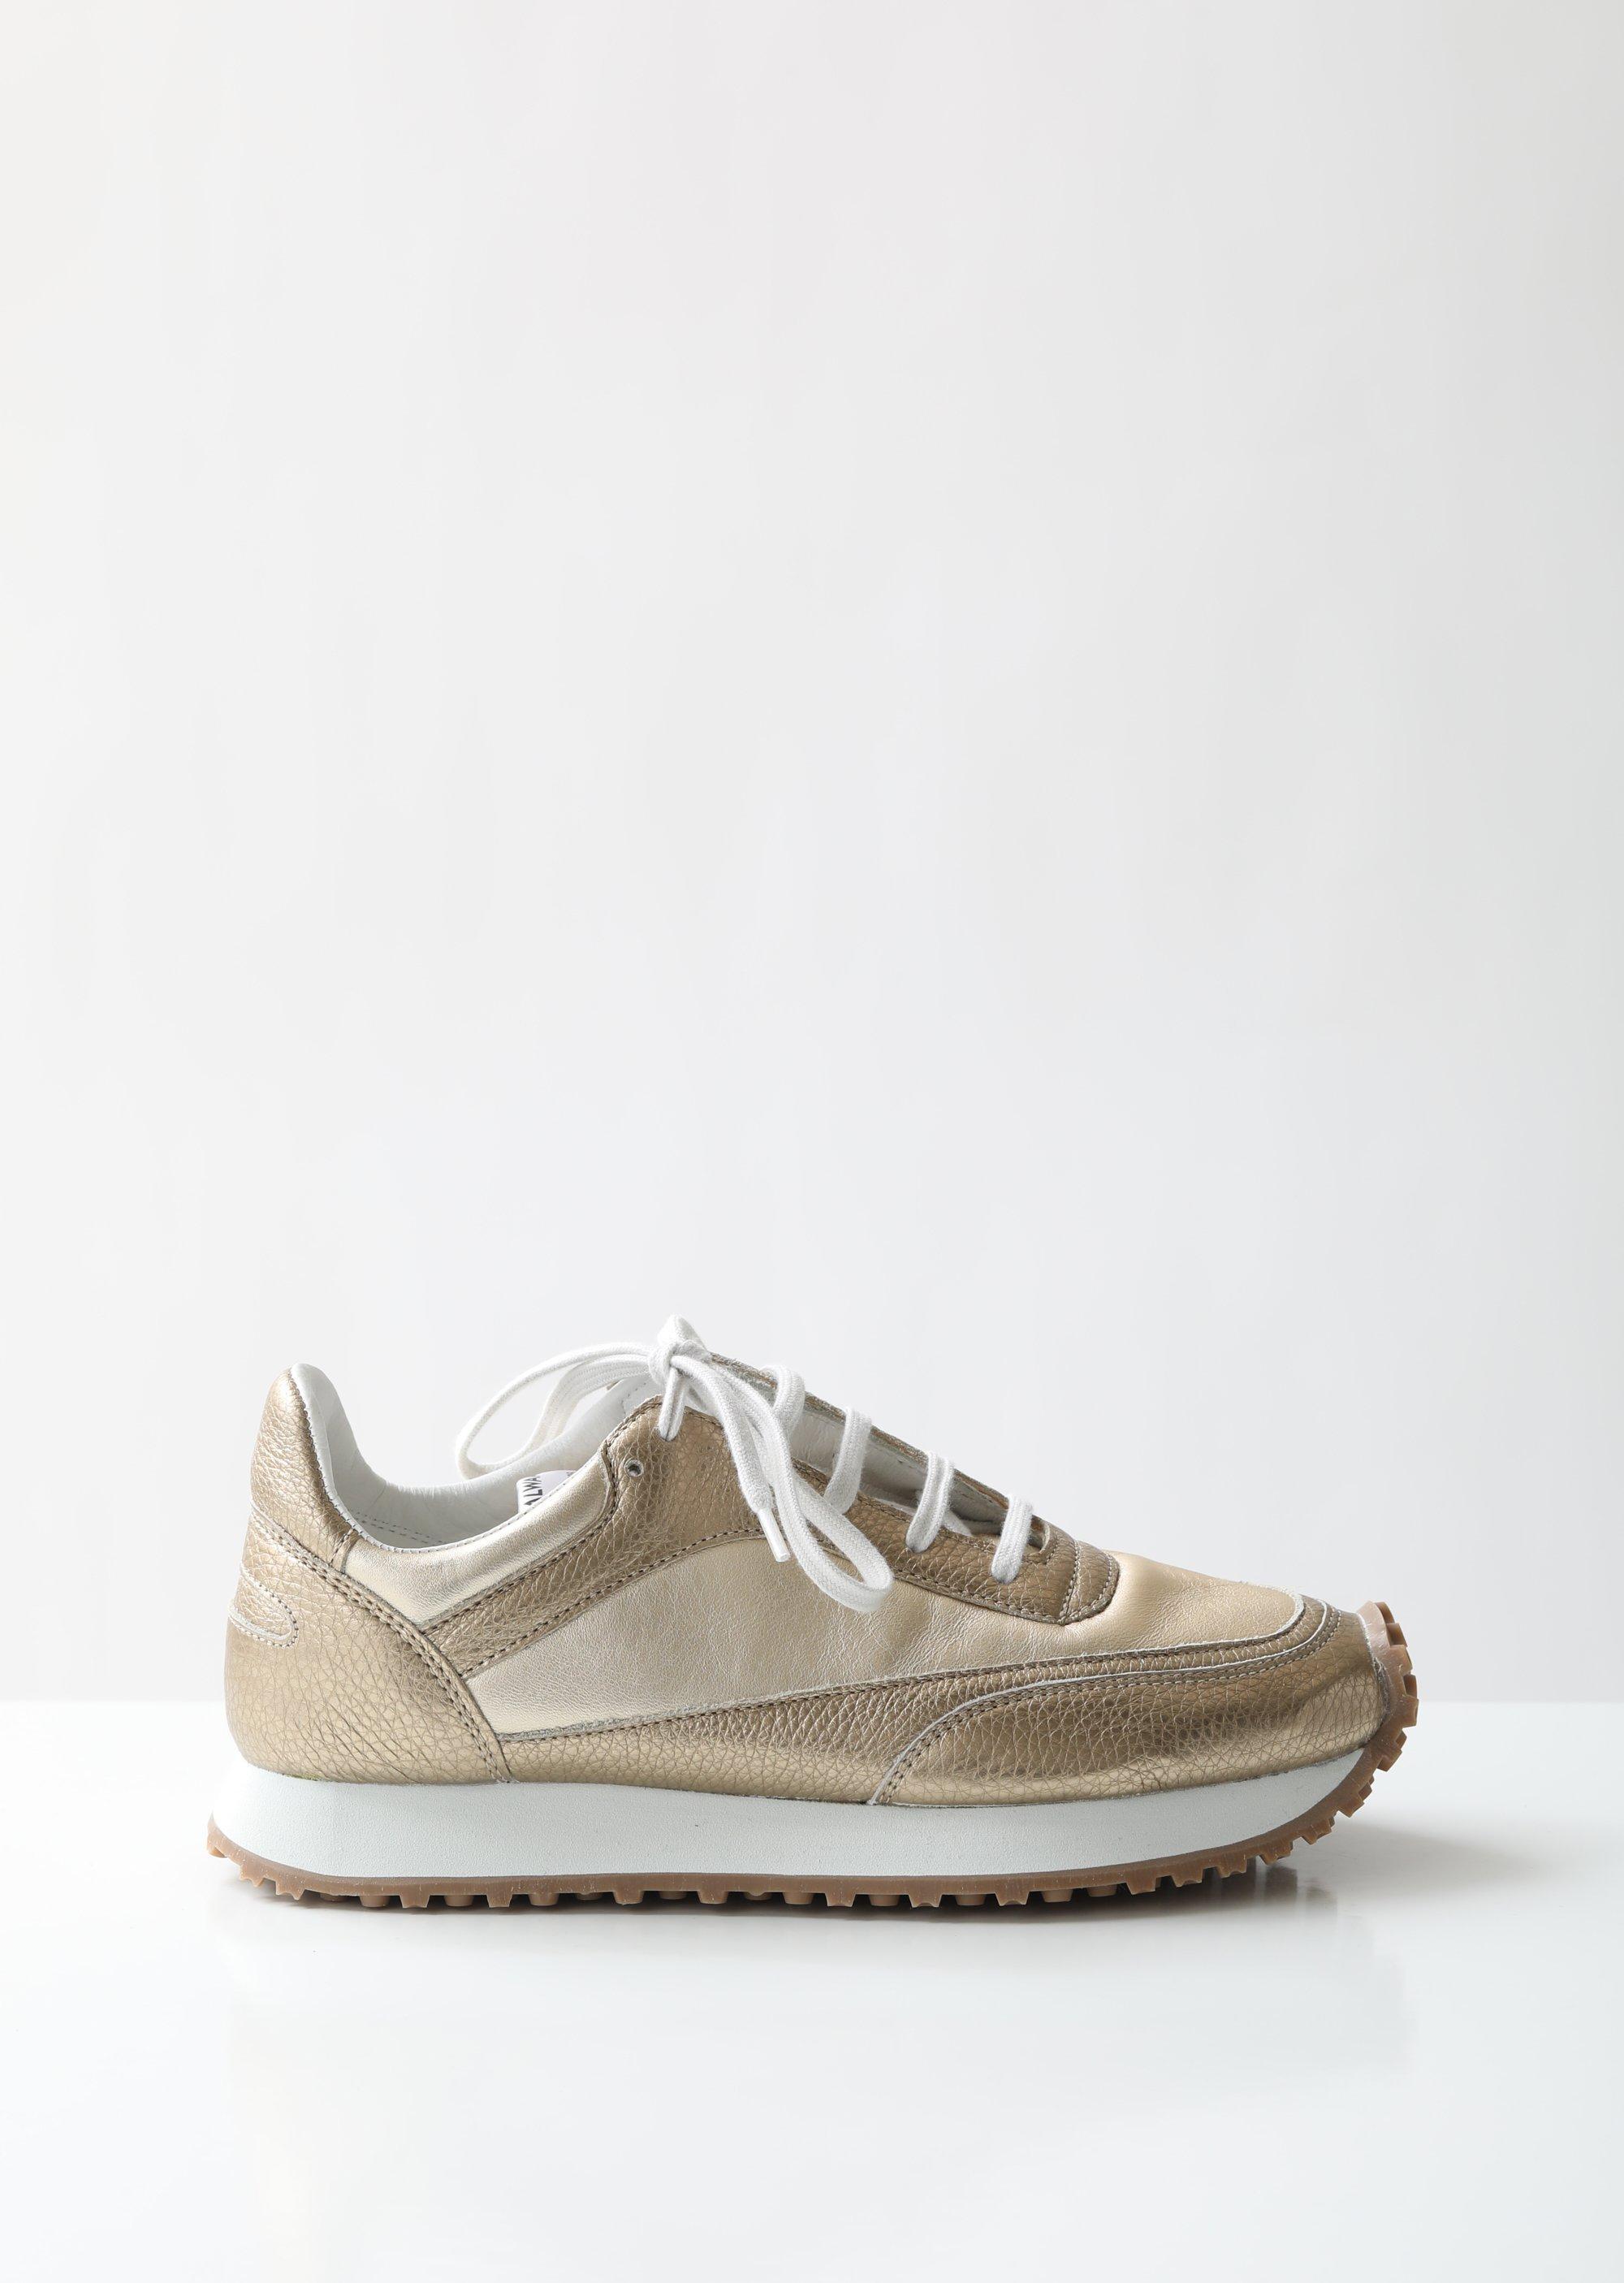 34c5aafa7a346d Comme des Garçons. Women s Metallic Cdg Cdg X Spalwart New Tempo Sneakers